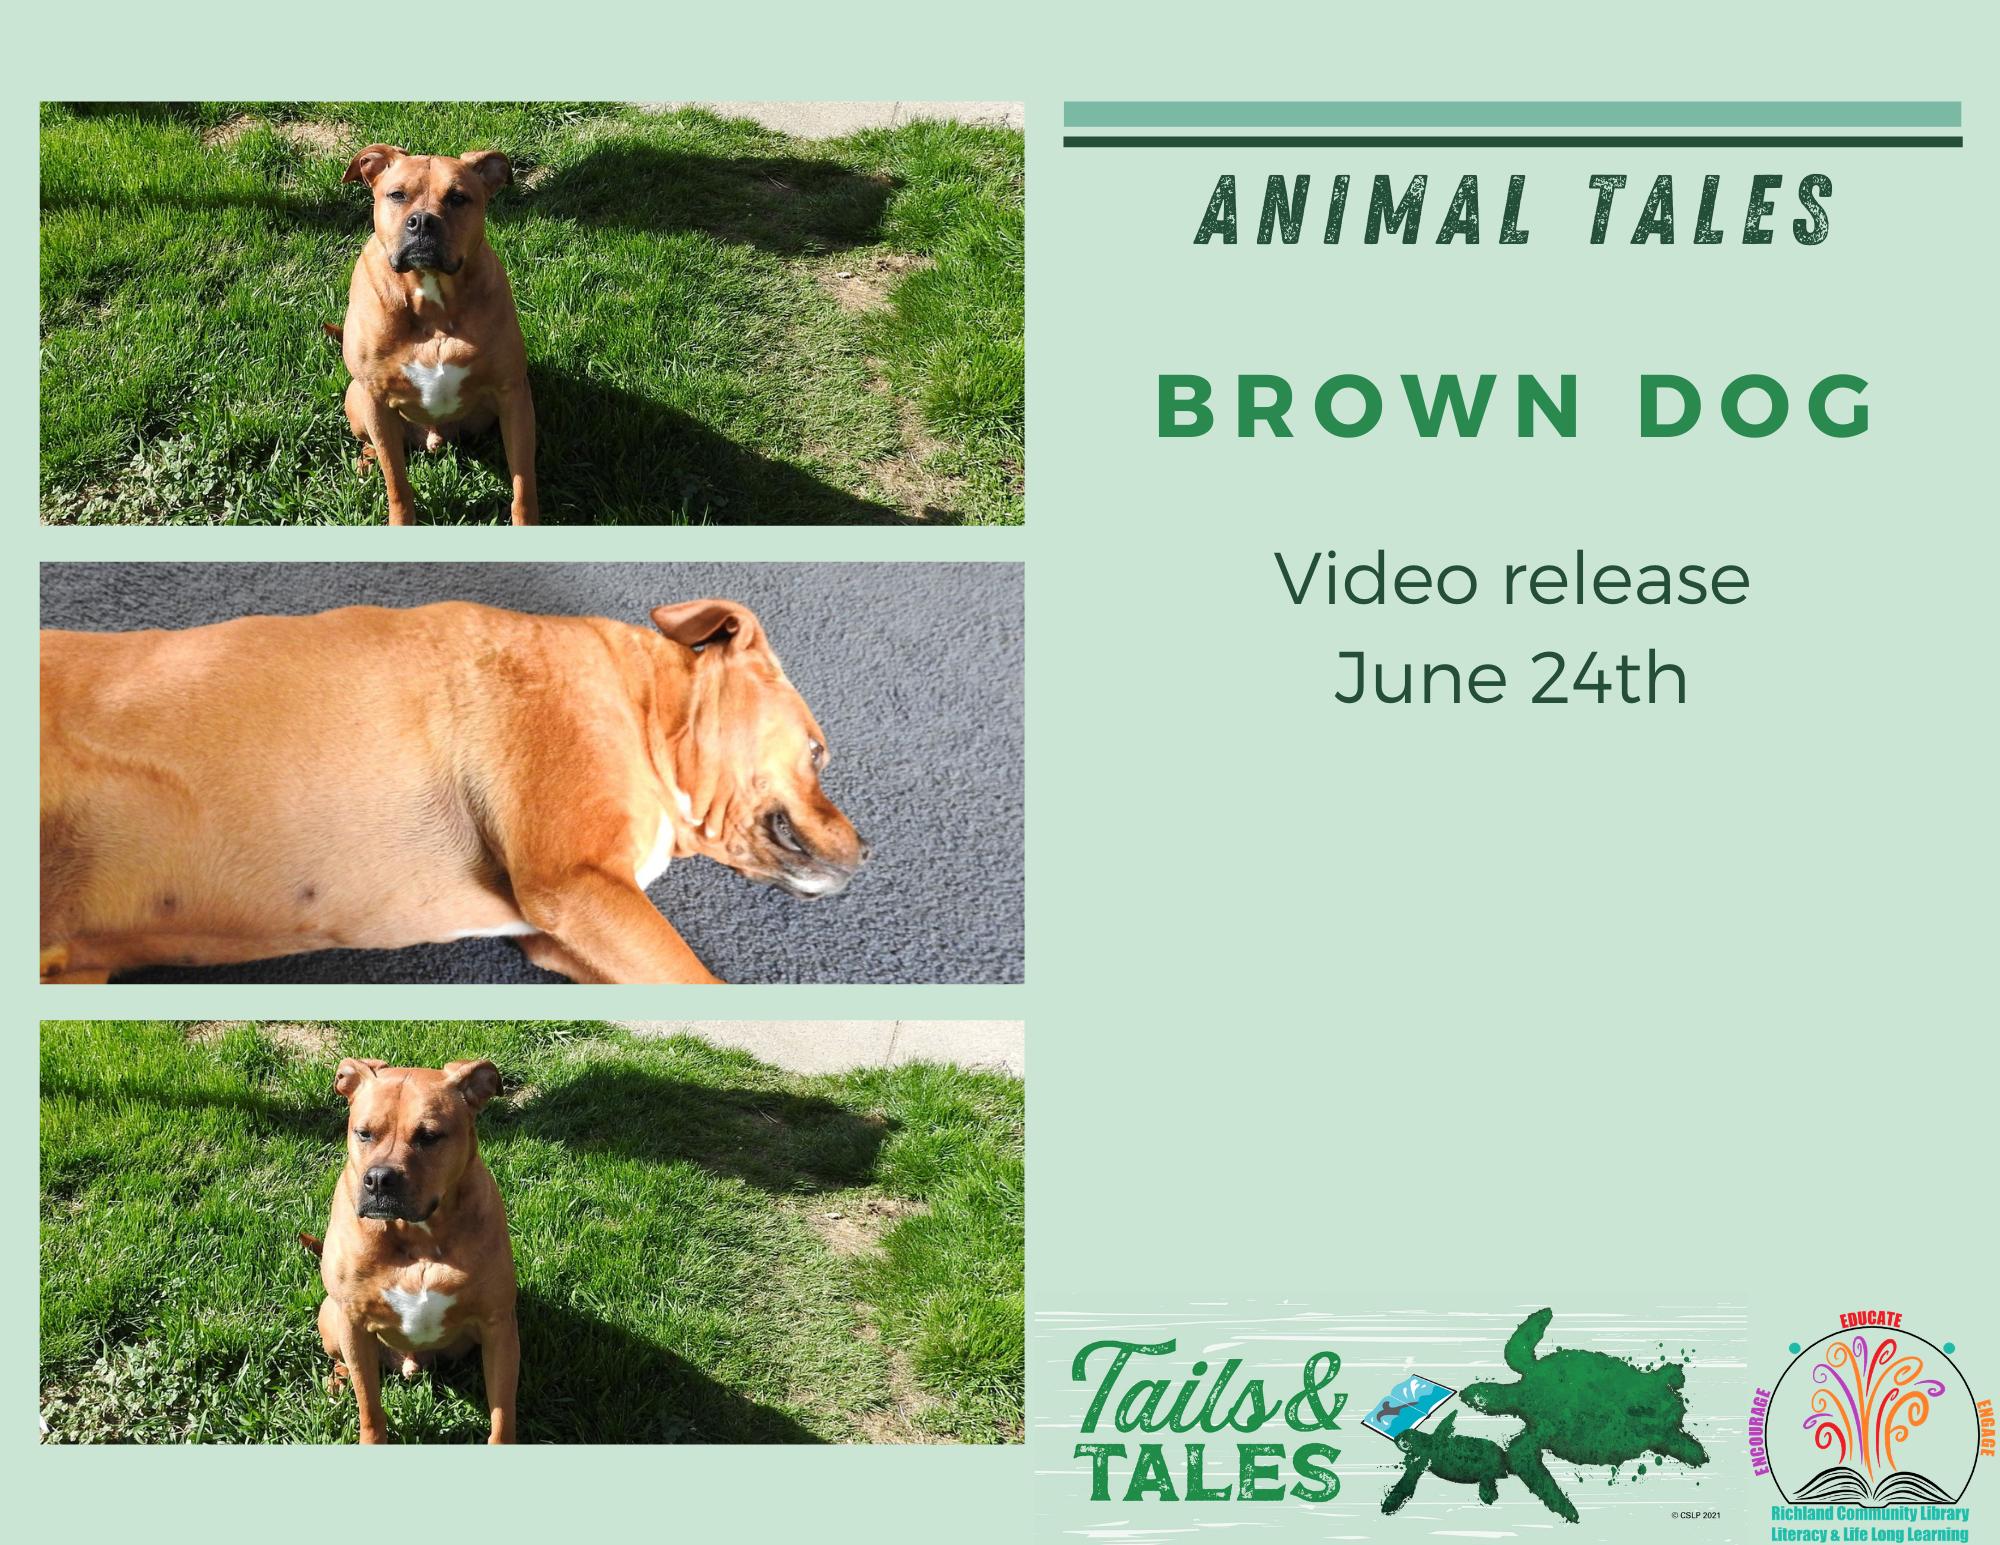 Animal Tales Video